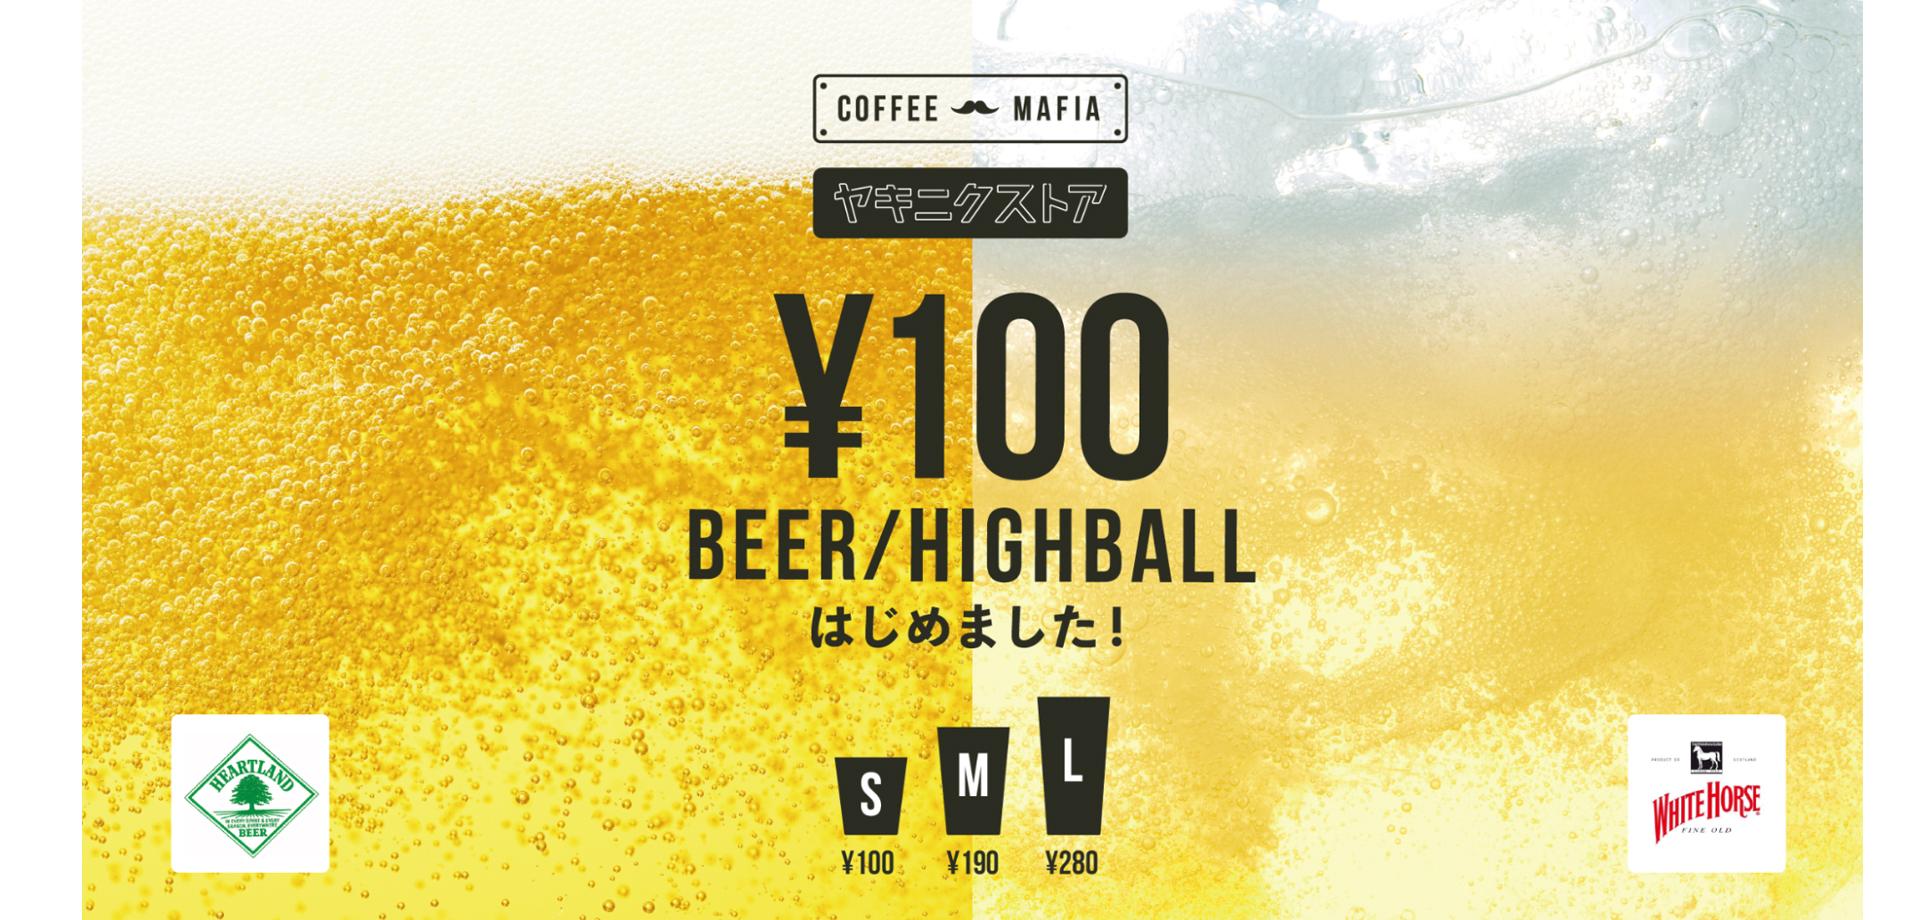 『coffee mafia 西新宿』と『ヤキニクストア』 100円生ビール・ハイボール